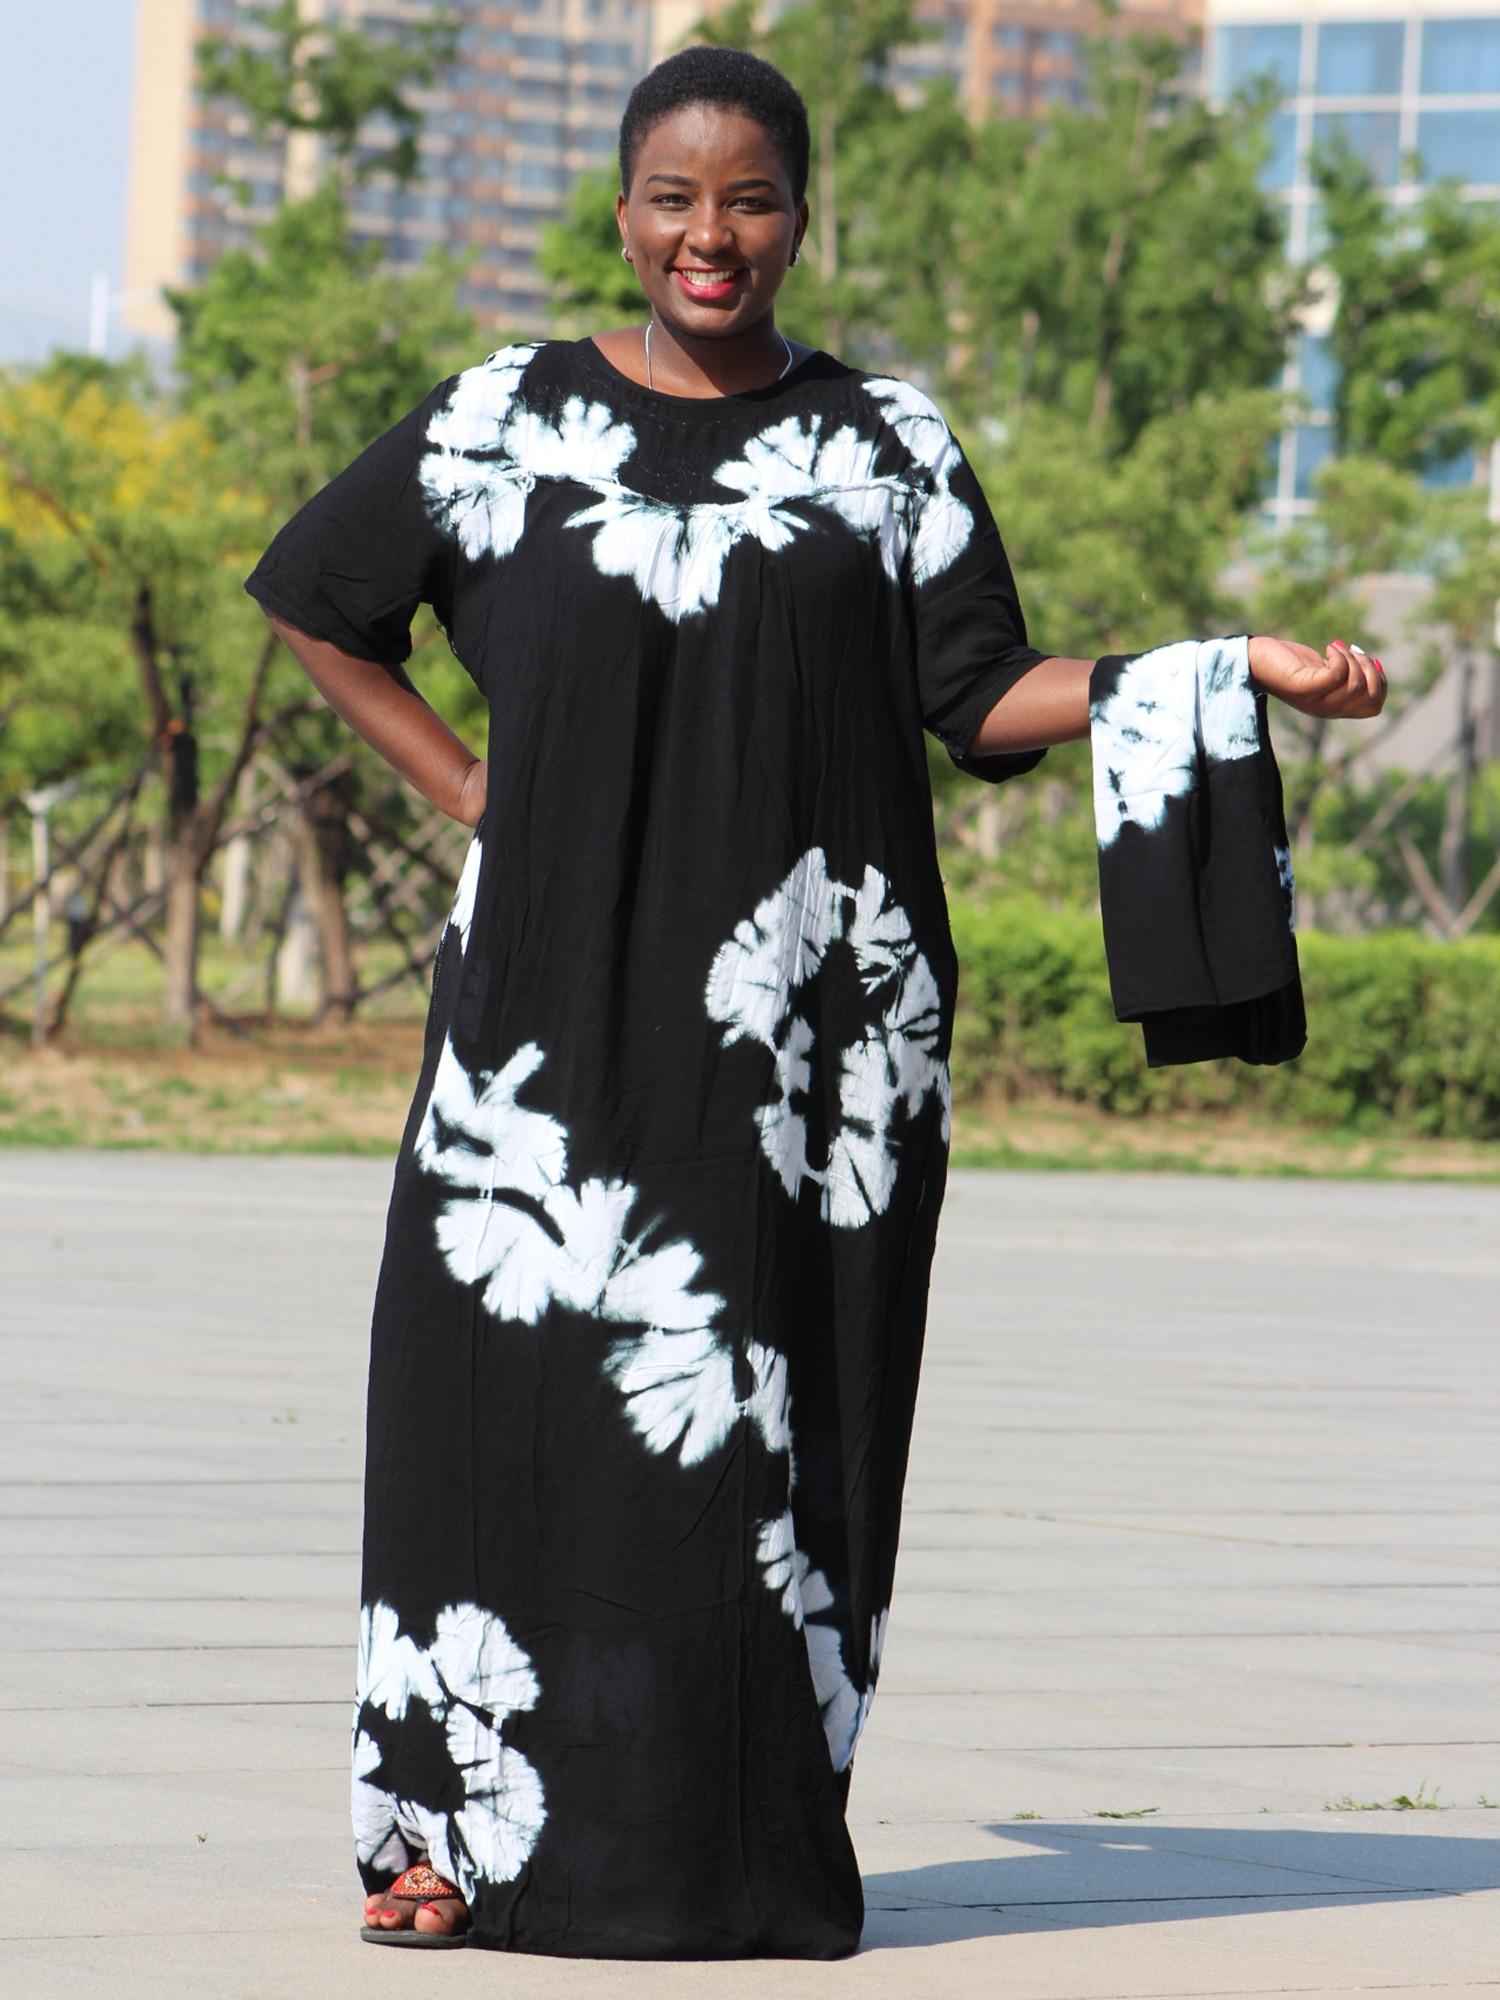 Dashikiage-فستان من القطن الأسود ، ناعم ومريح ، مع وشاح كبير